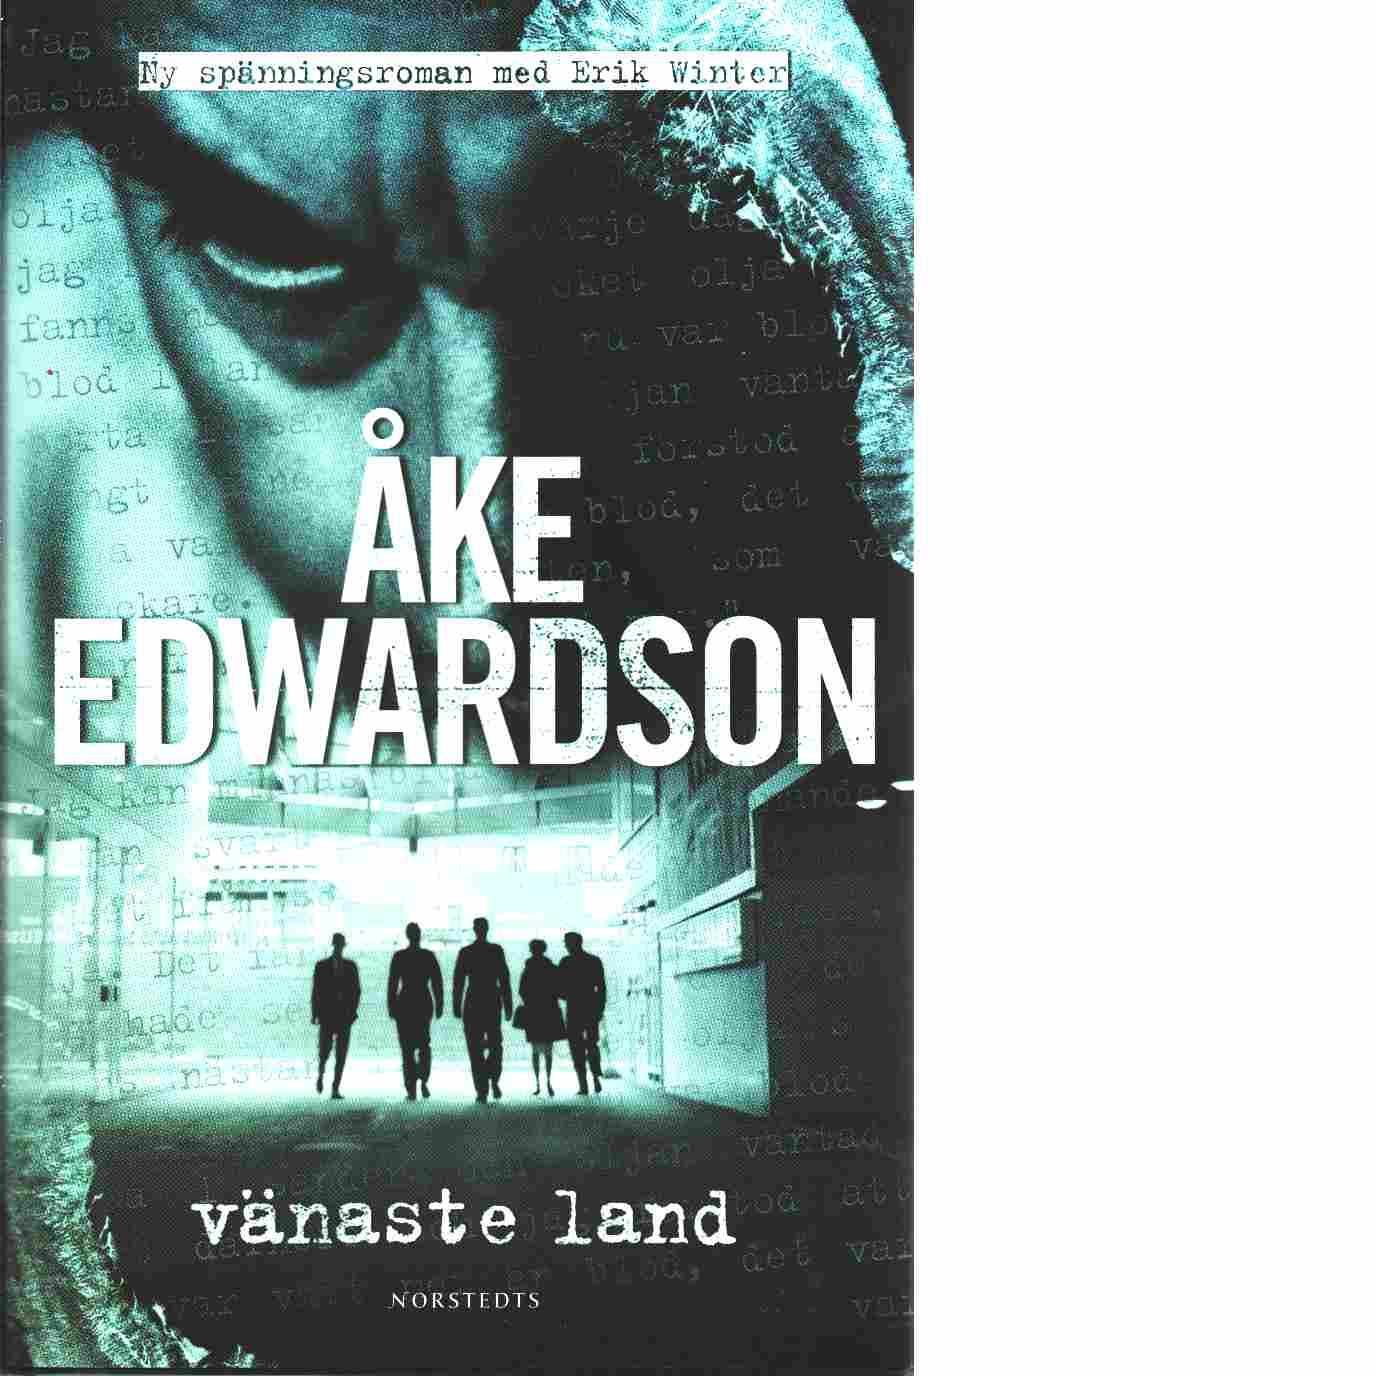 Vänaste land - Edwardson, Åke